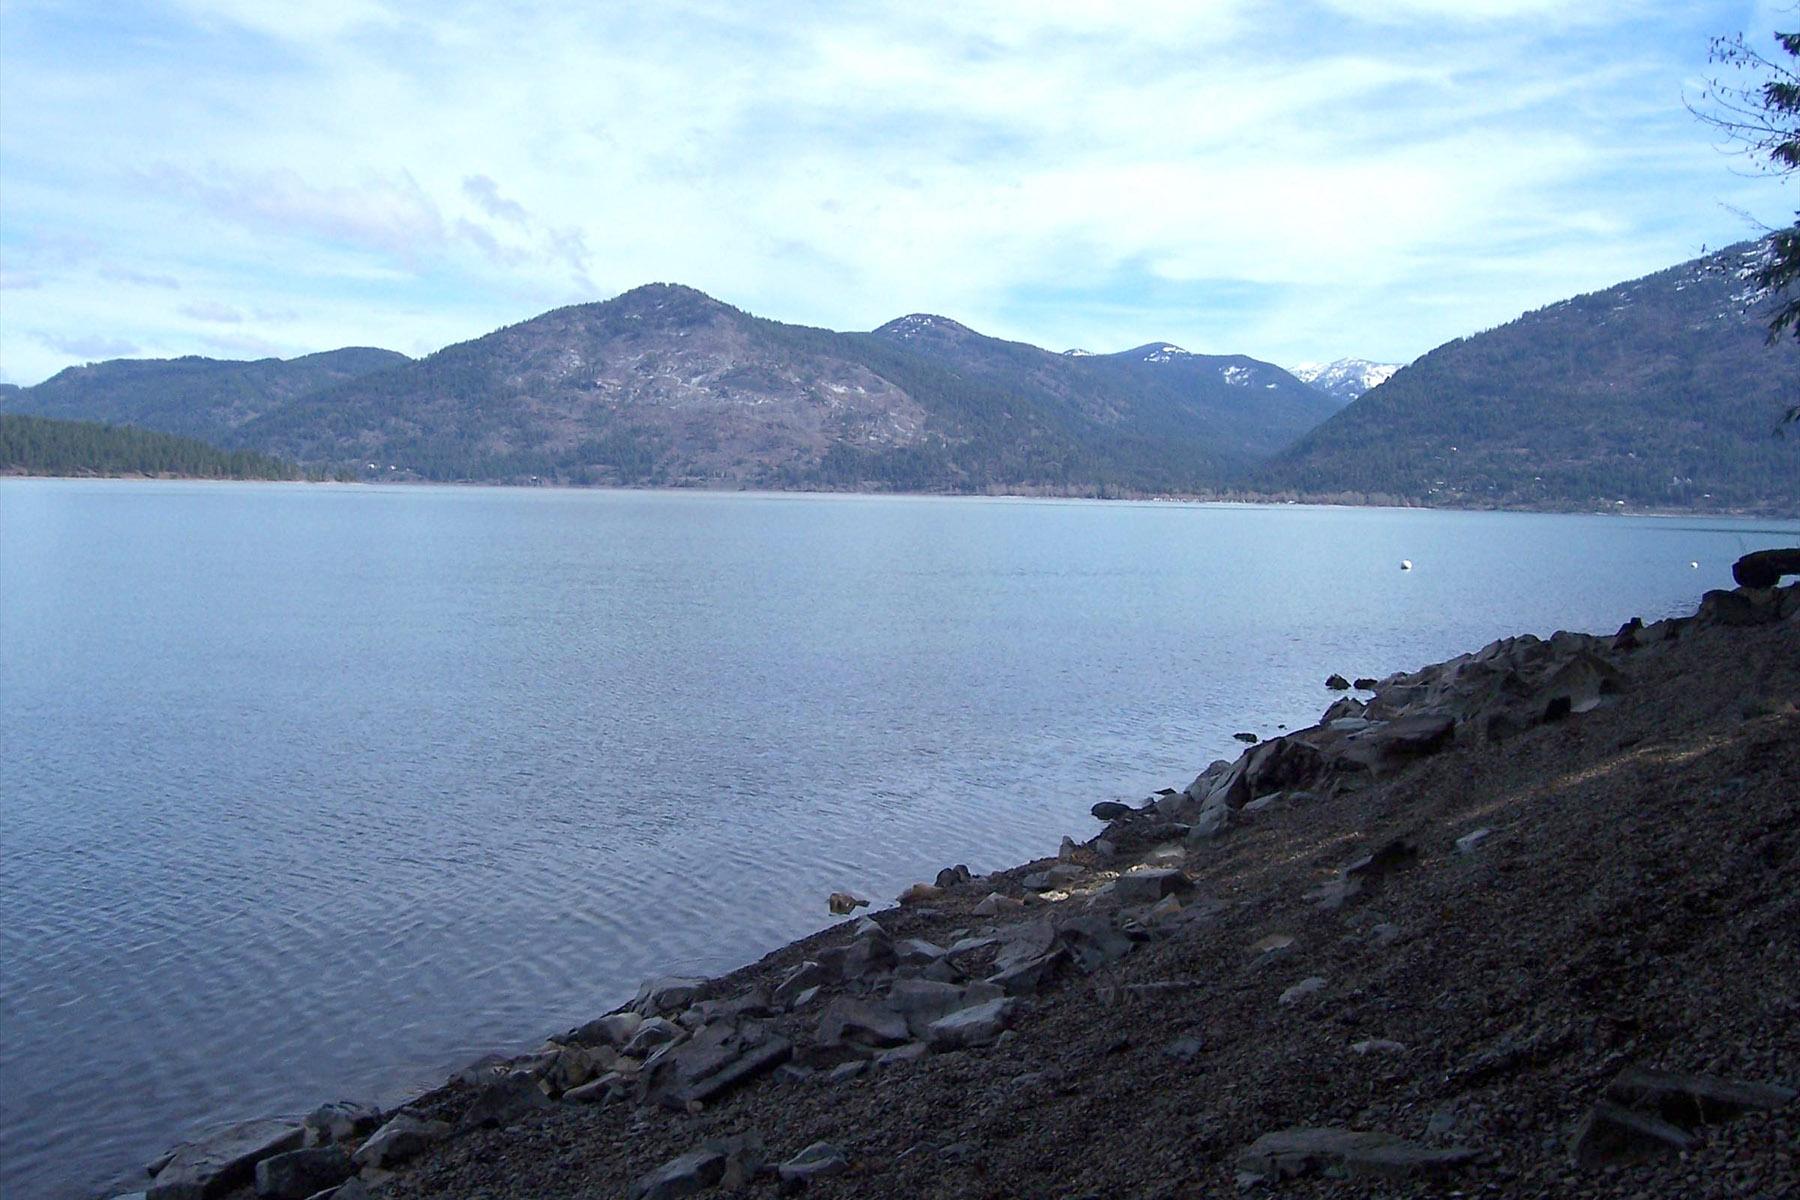 Land for Sale at Panoramic Lake Pend Oreille Waterfront Lot Lot 6 Aerie Lane Sagle, Idaho, 83864 United States